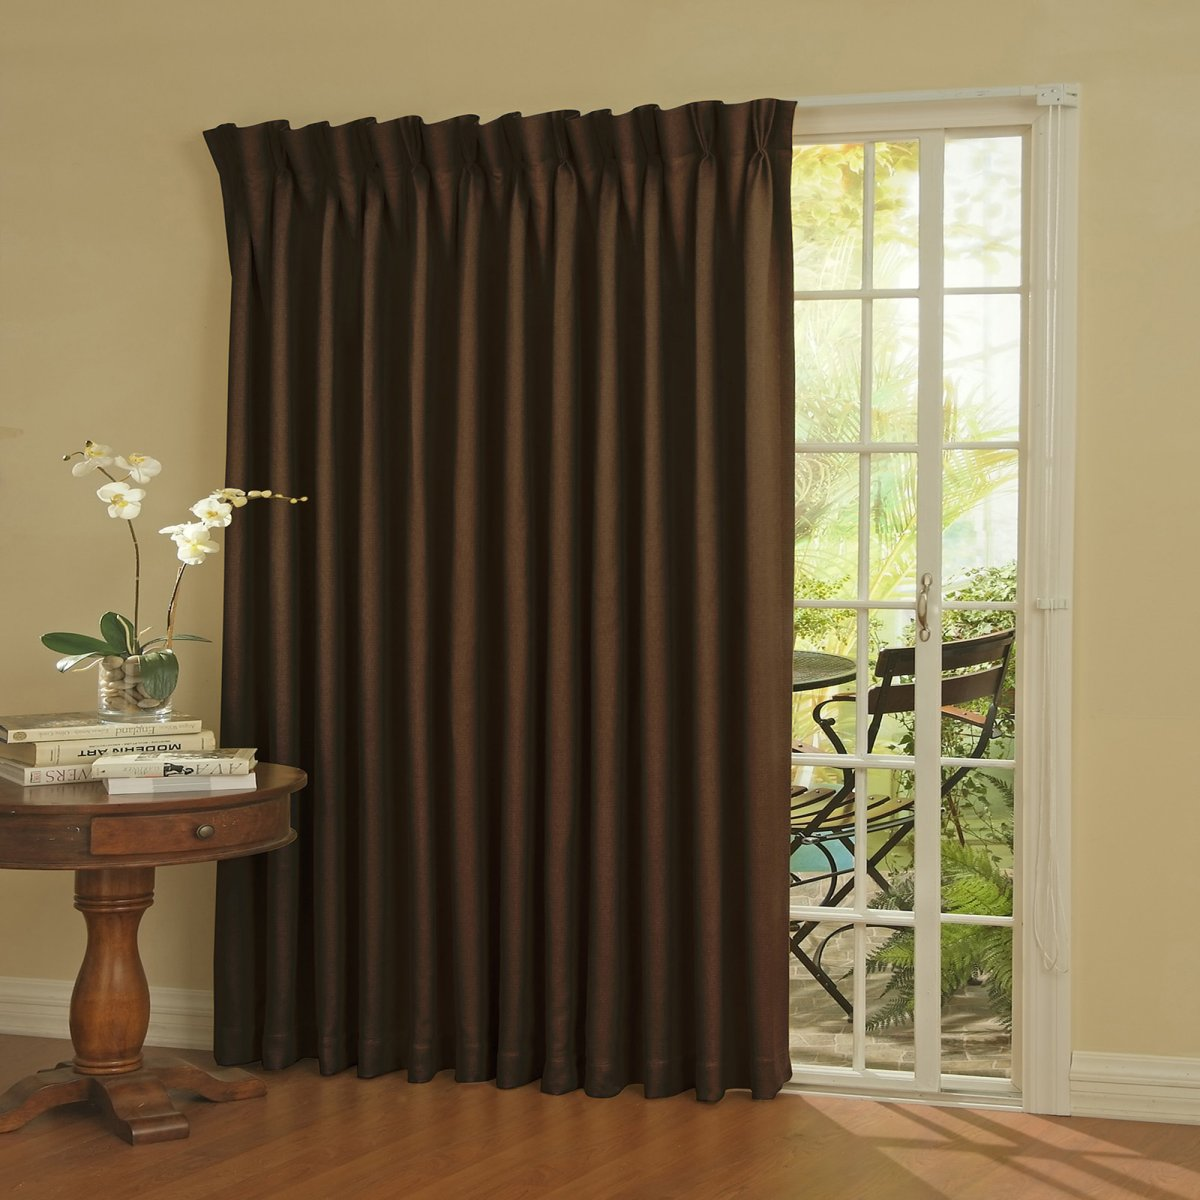 Curtain Ideas for Sliding Glass Door | My Decorative on Draping Curtains Ideas  id=74709